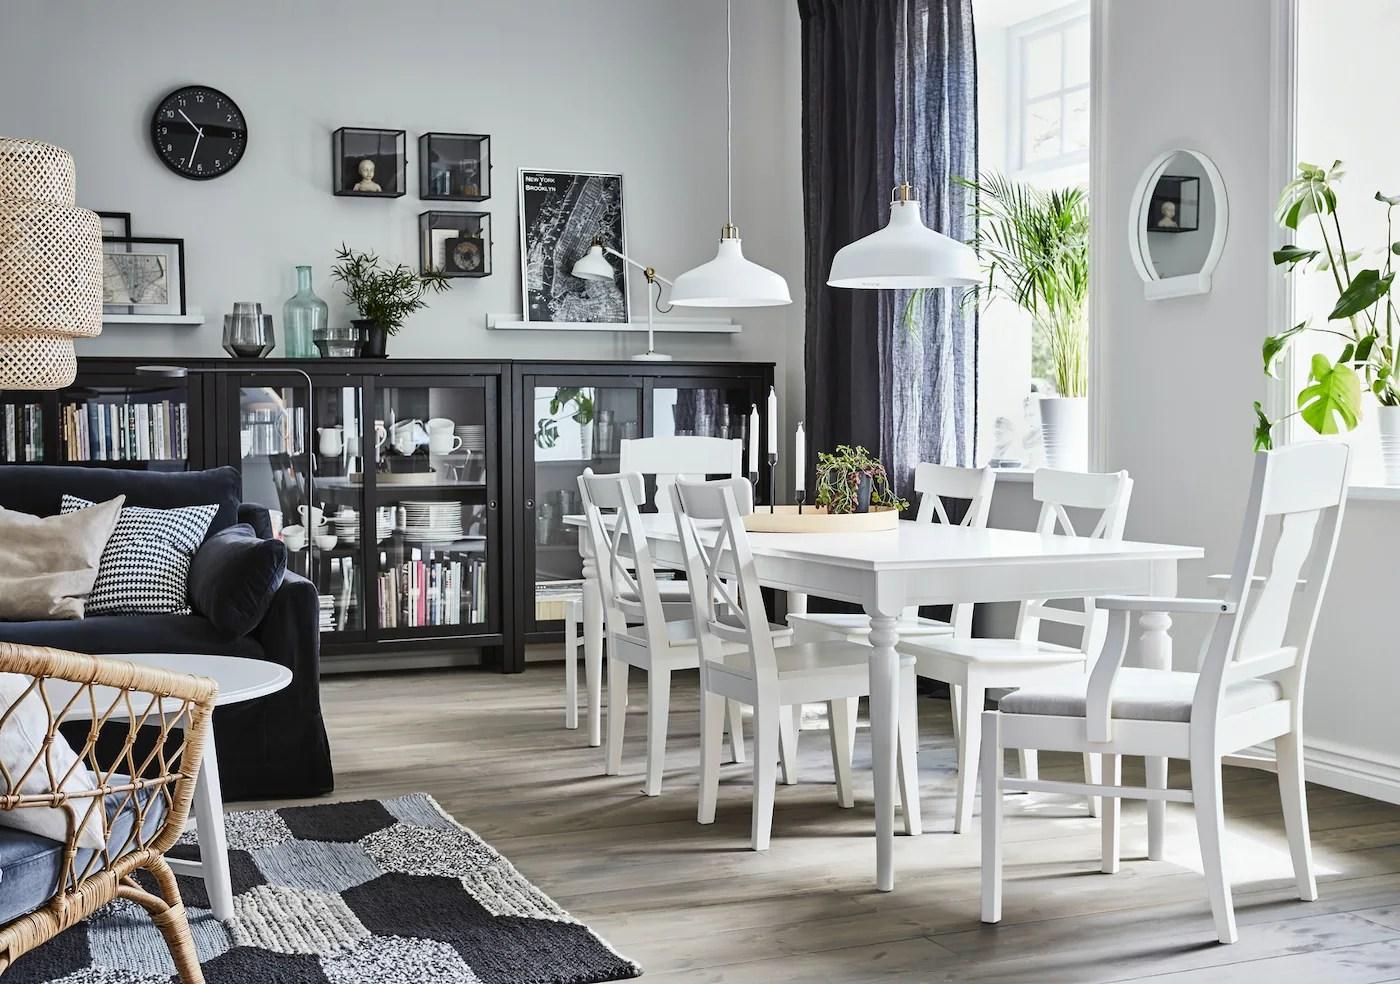 meuble salle a manger tables chaises